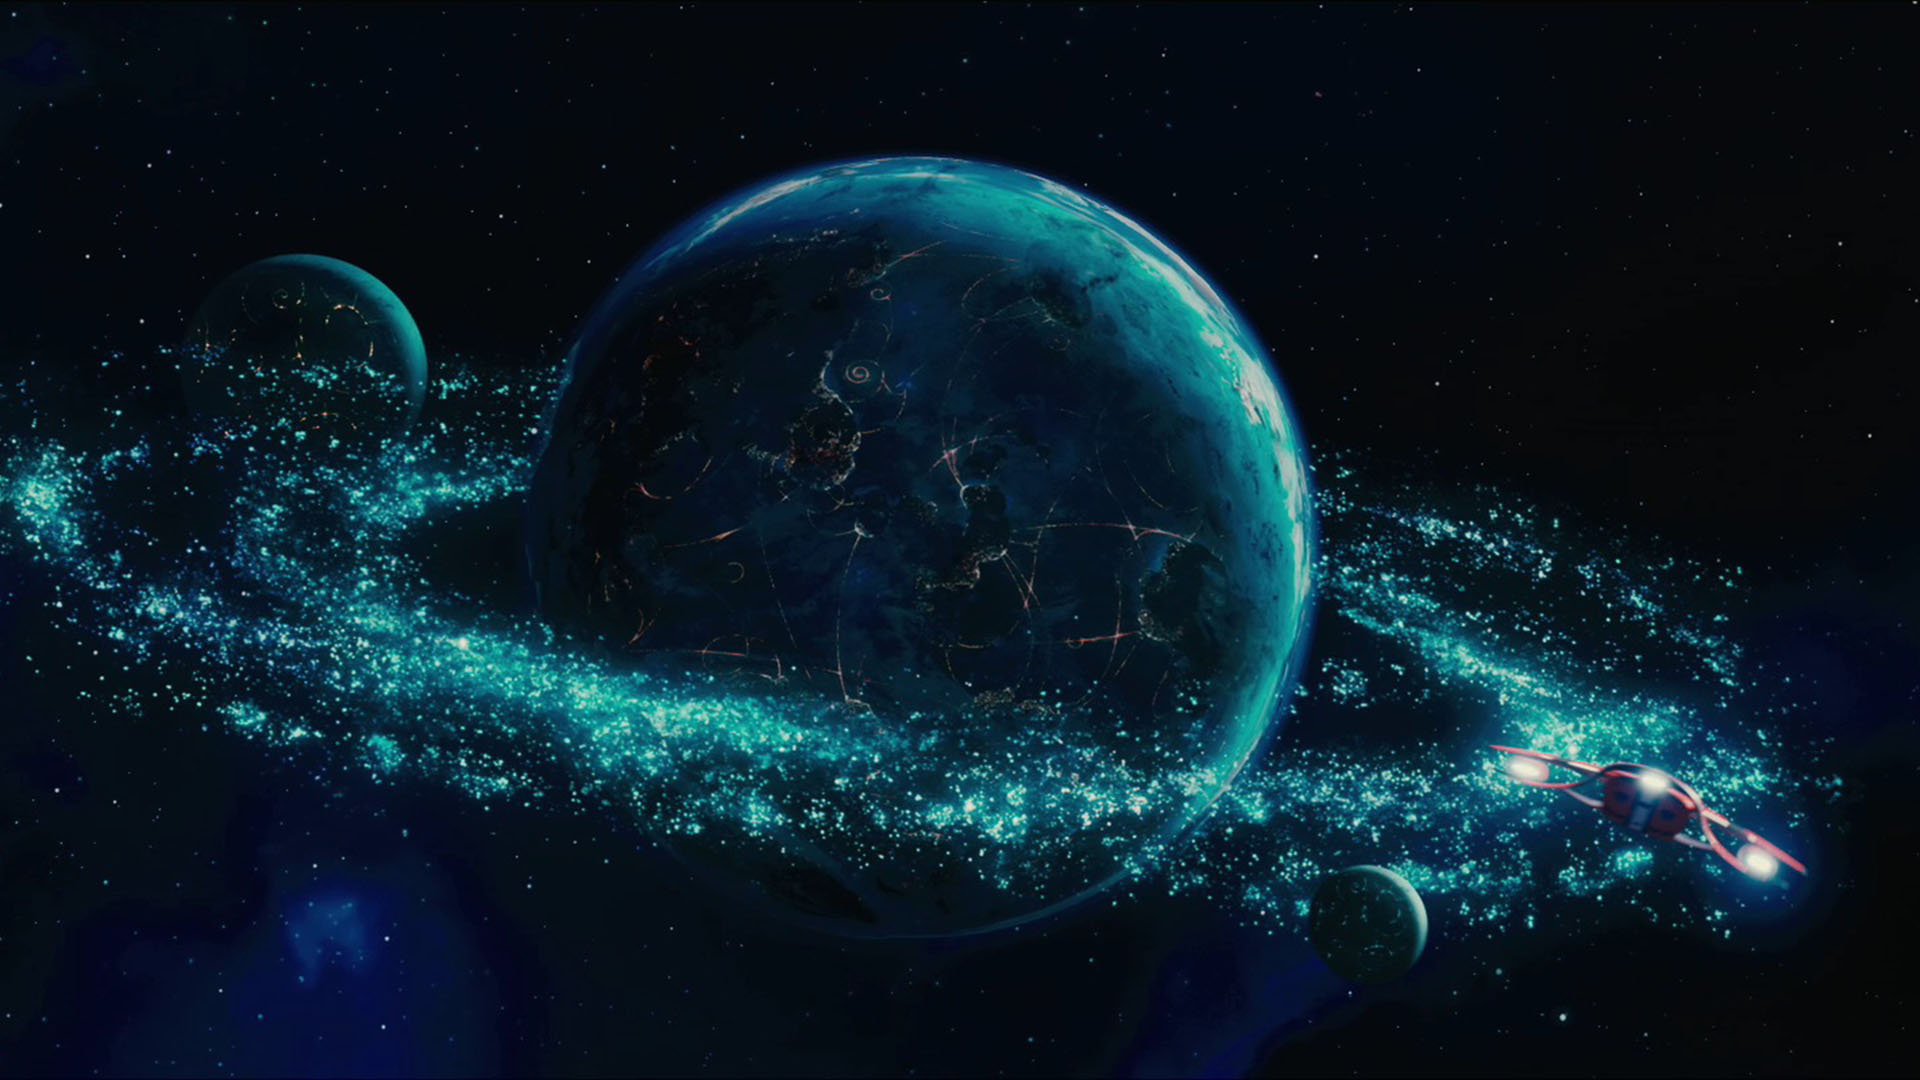 earth planet hd - photo #46